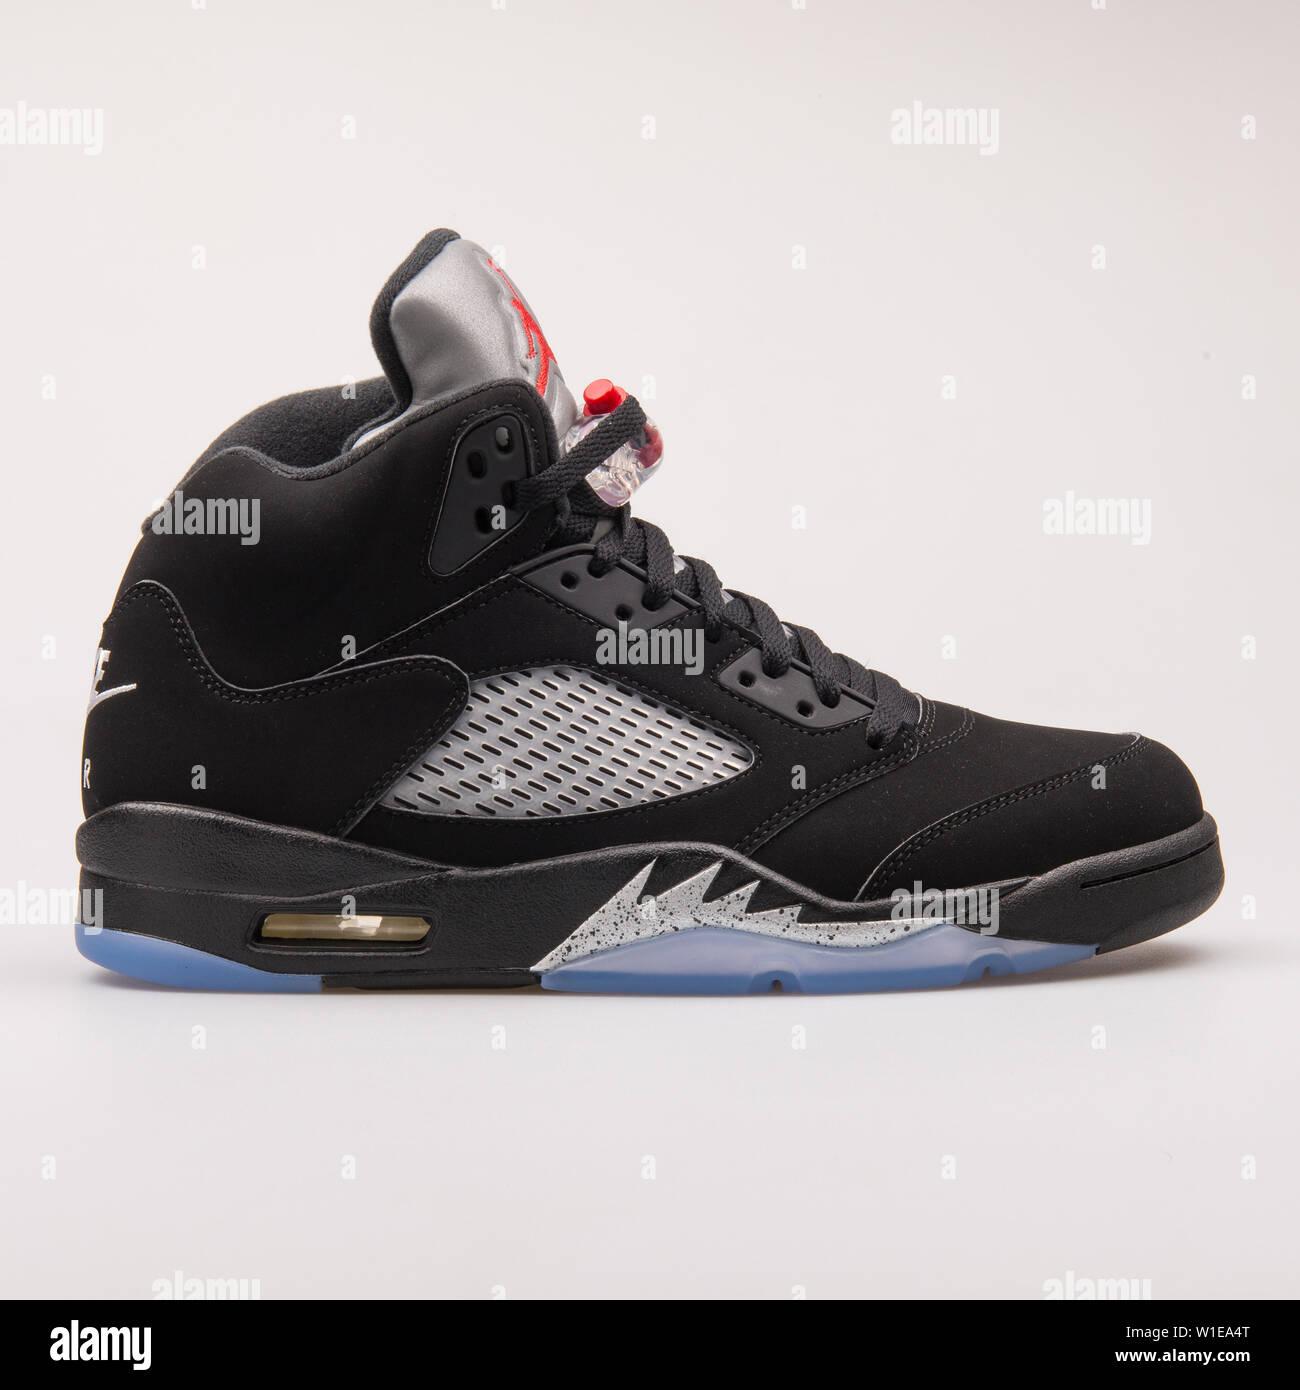 best website 45bcd 67fcf VIENNA, AUSTRIA - JUNE 14, 2017: Nike Air Jordan 5 Retro OG ...